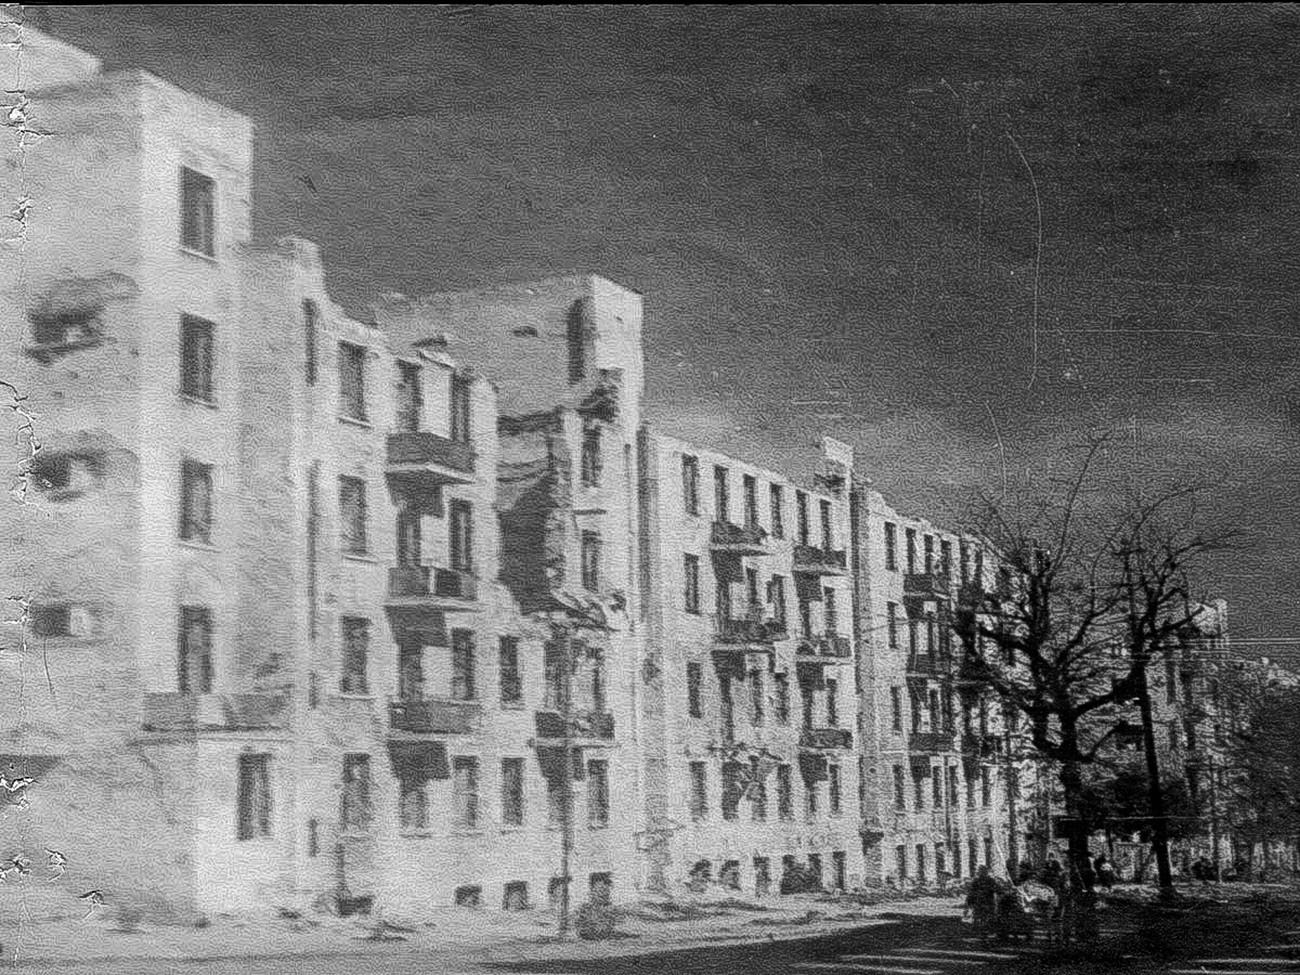 Pabrik di ulitsa Karla Marksa.